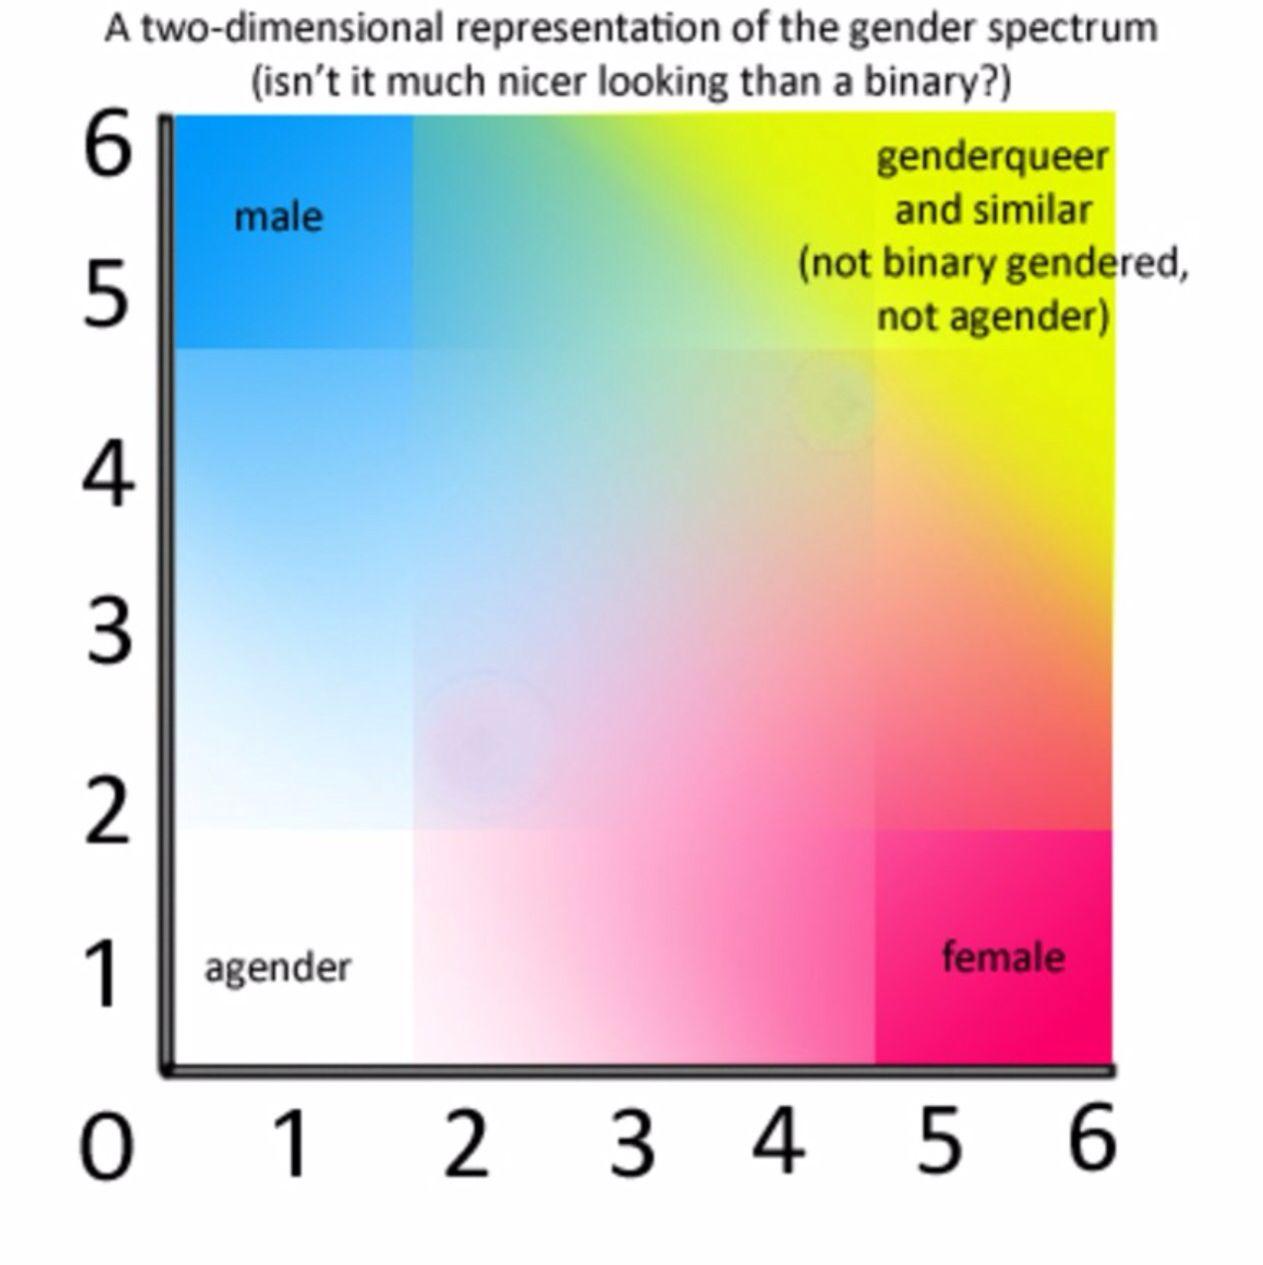 2d Representation Of The Gender Spectrum